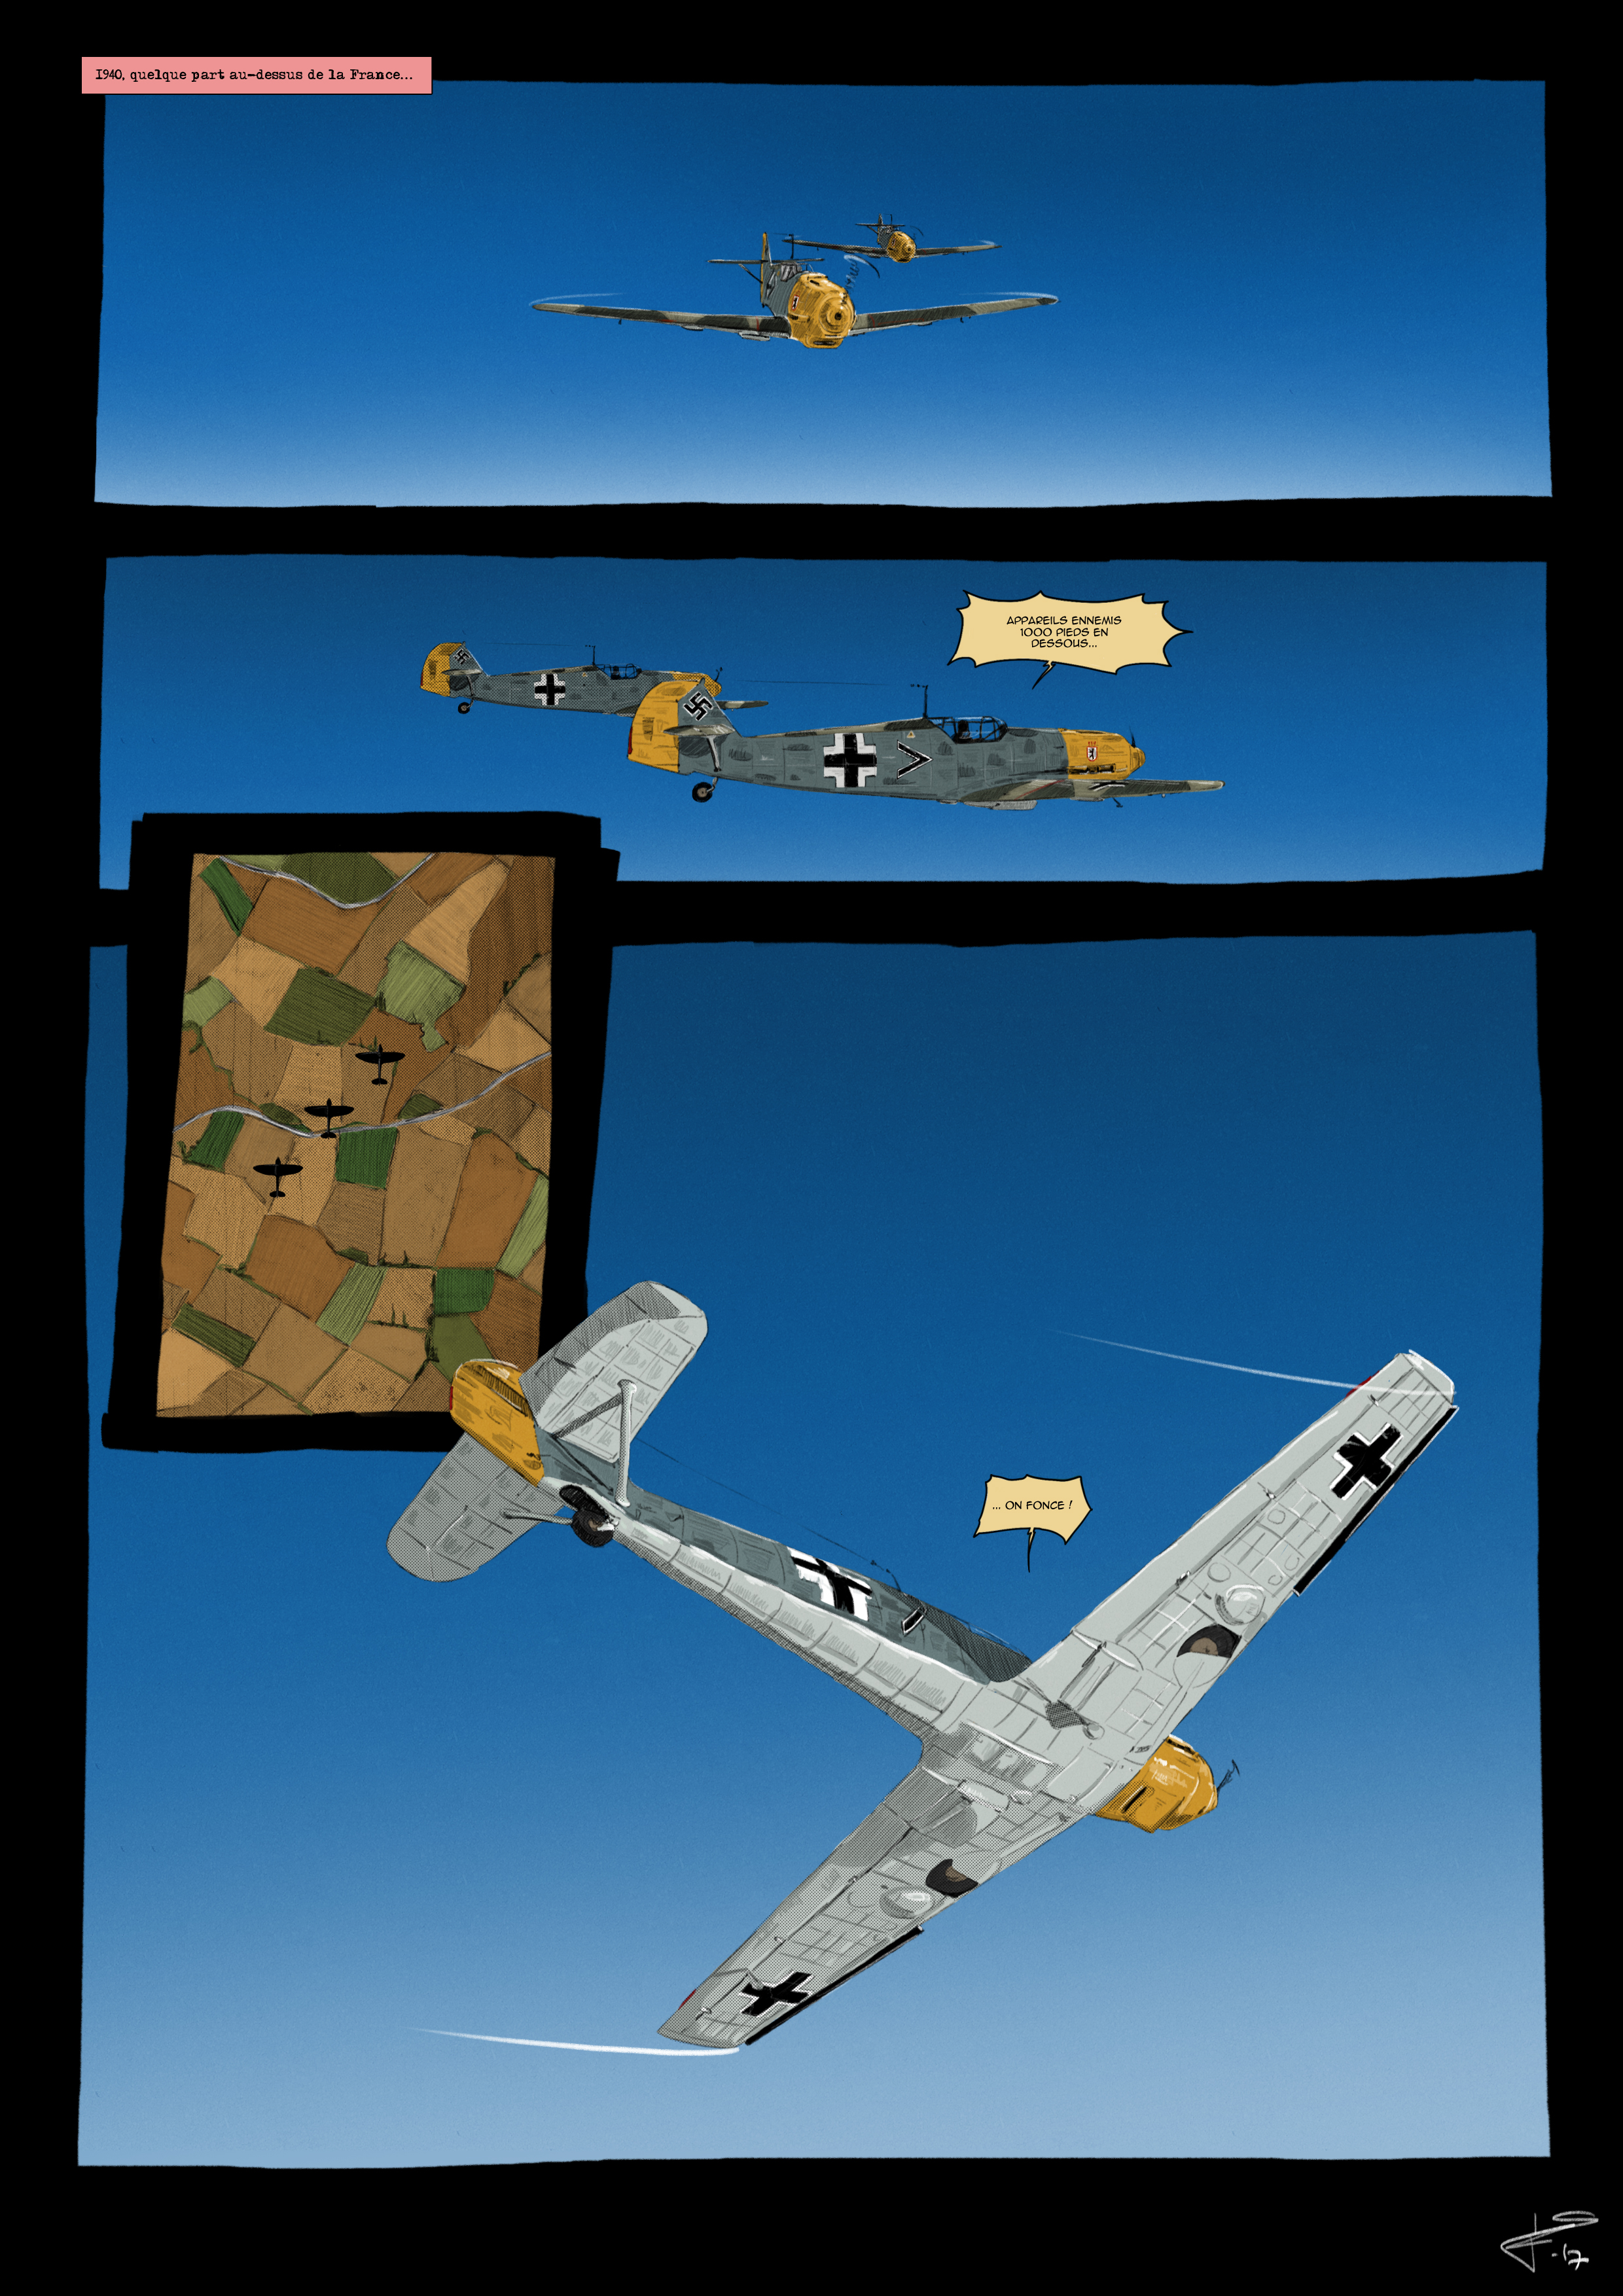 BF-109 patrol by Fisher22